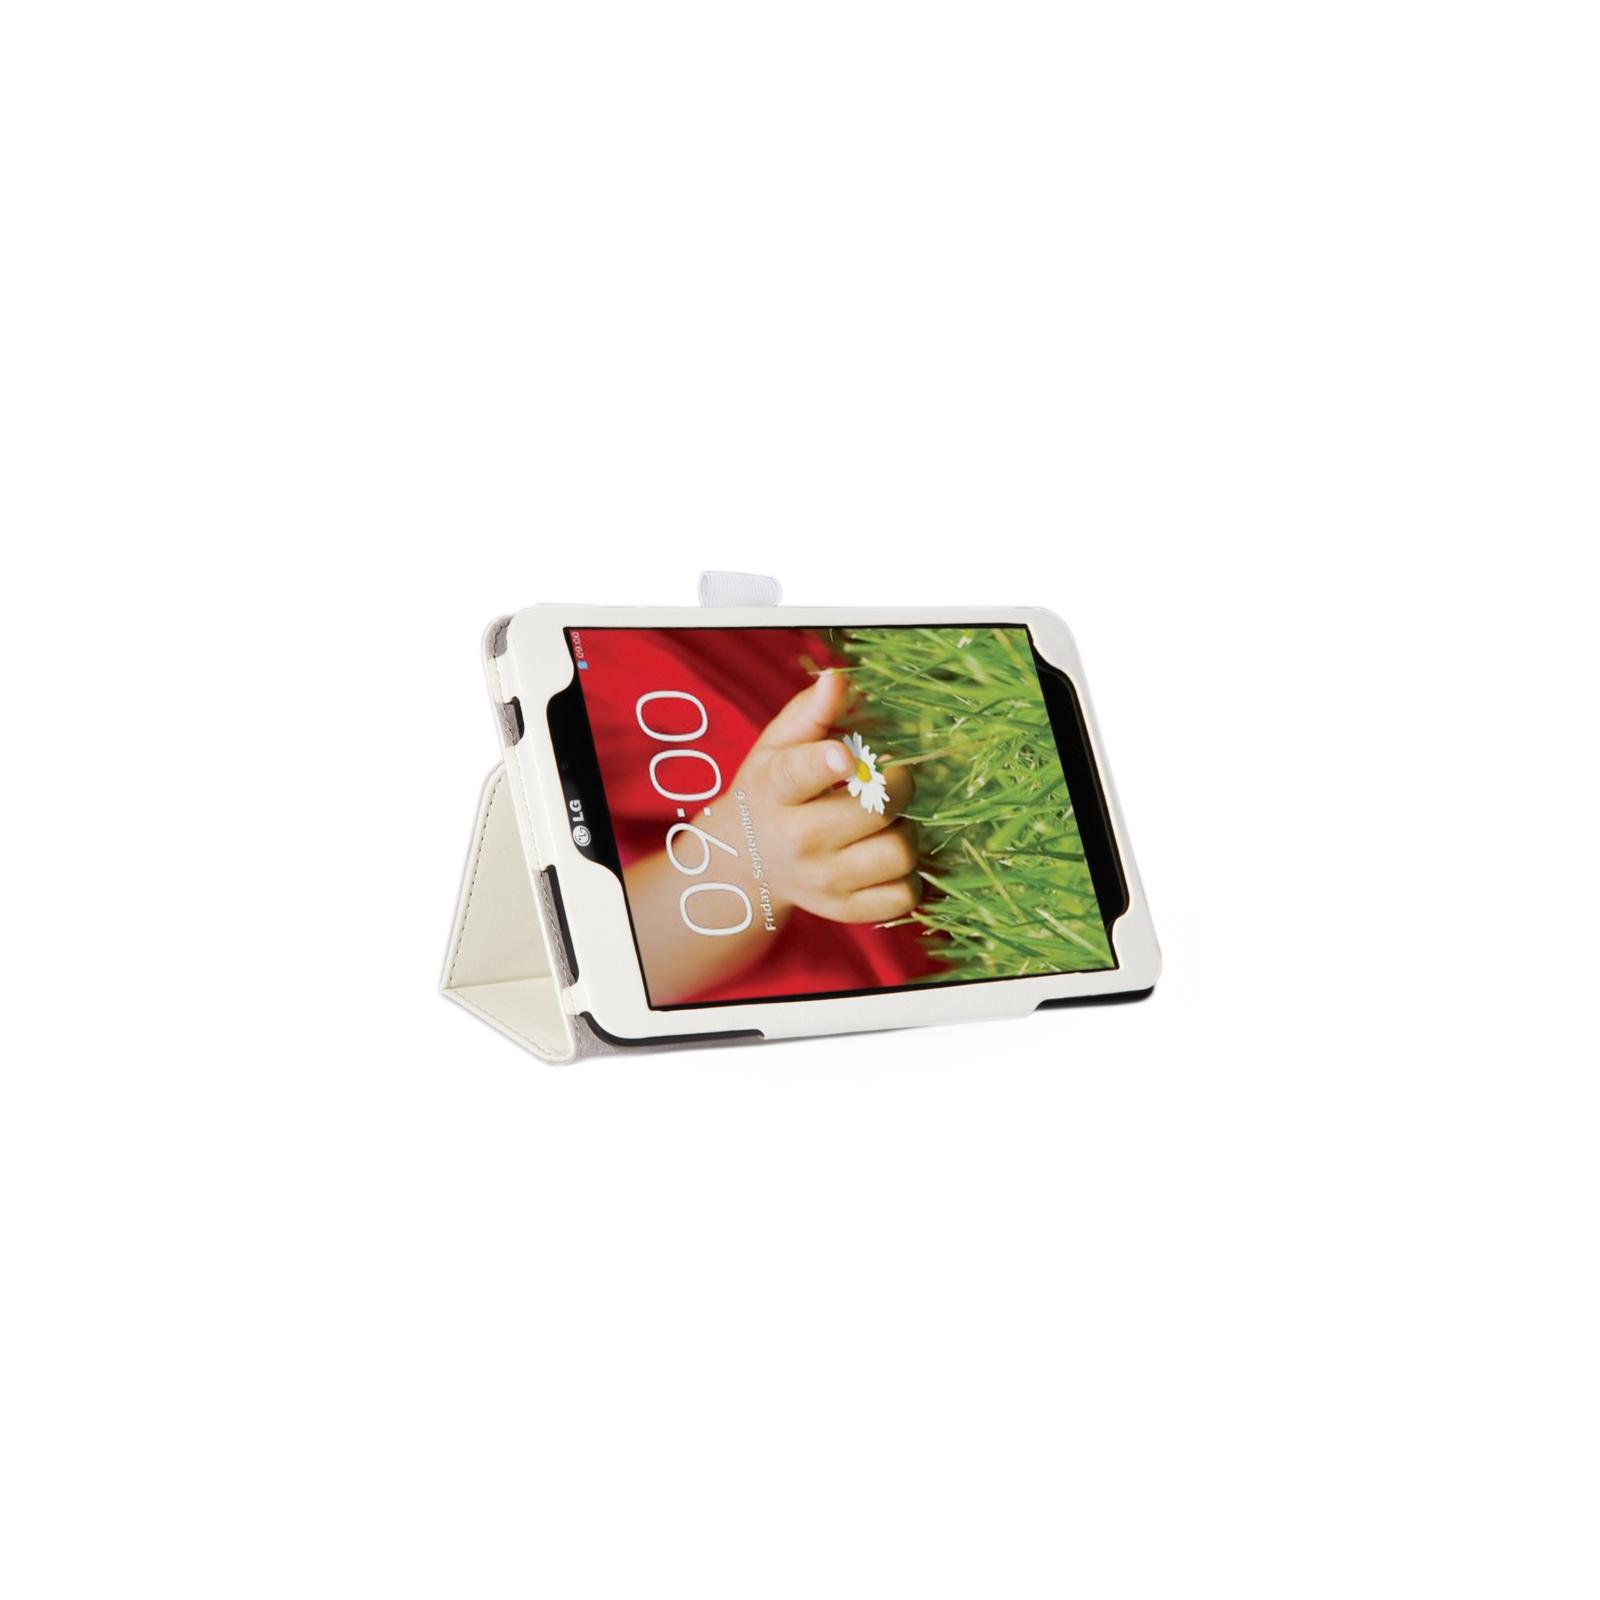 Чехол для планшета AirOn для LG G Pad 8.3 white (6946795850113) изображение 2